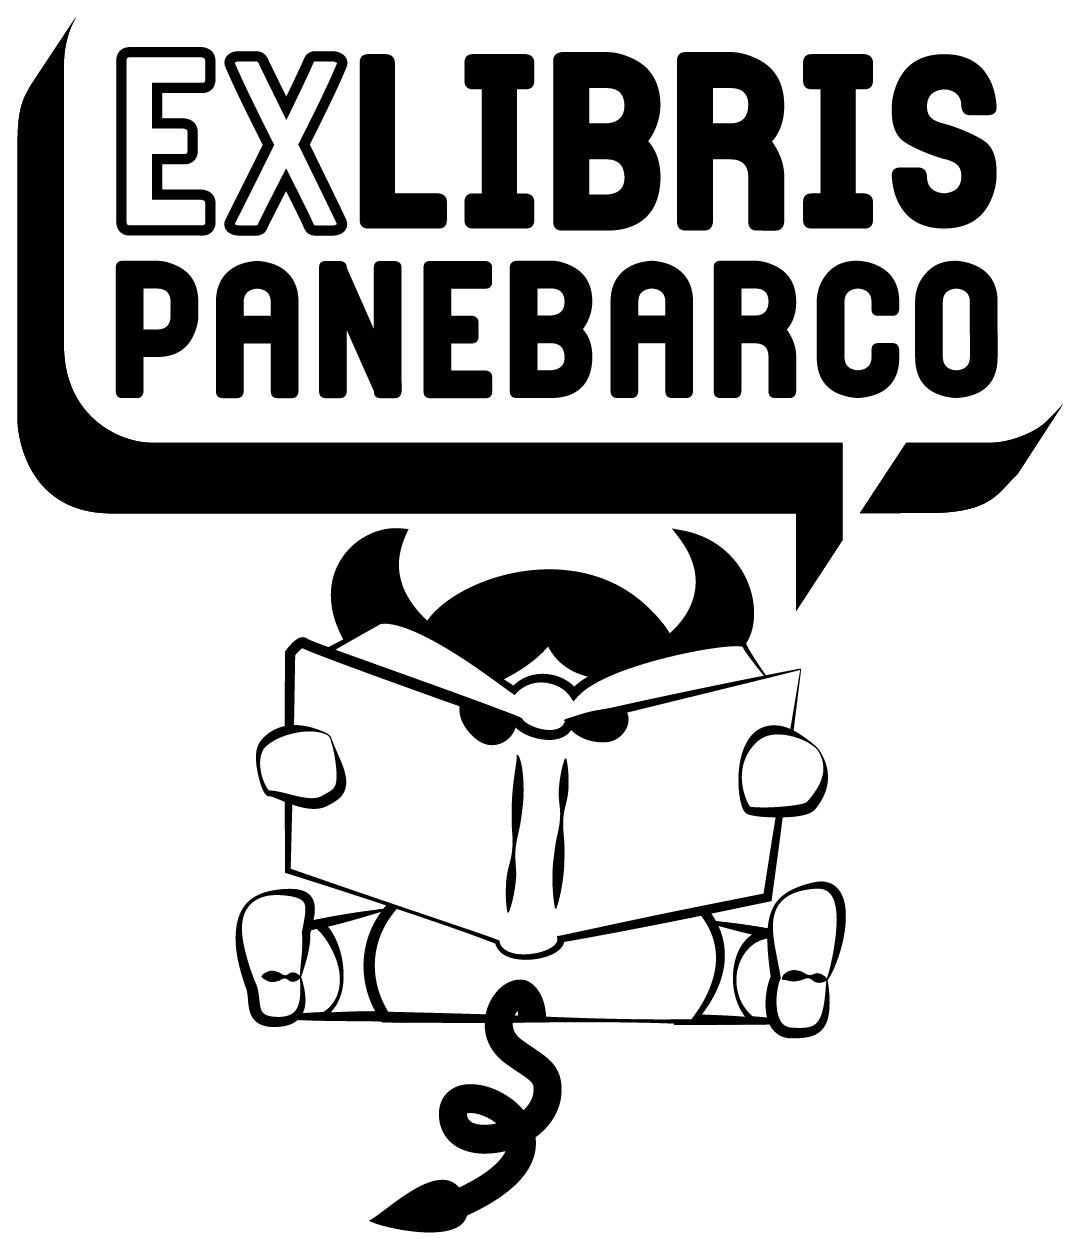 Panebarco Social Library - ex libris con minotauro